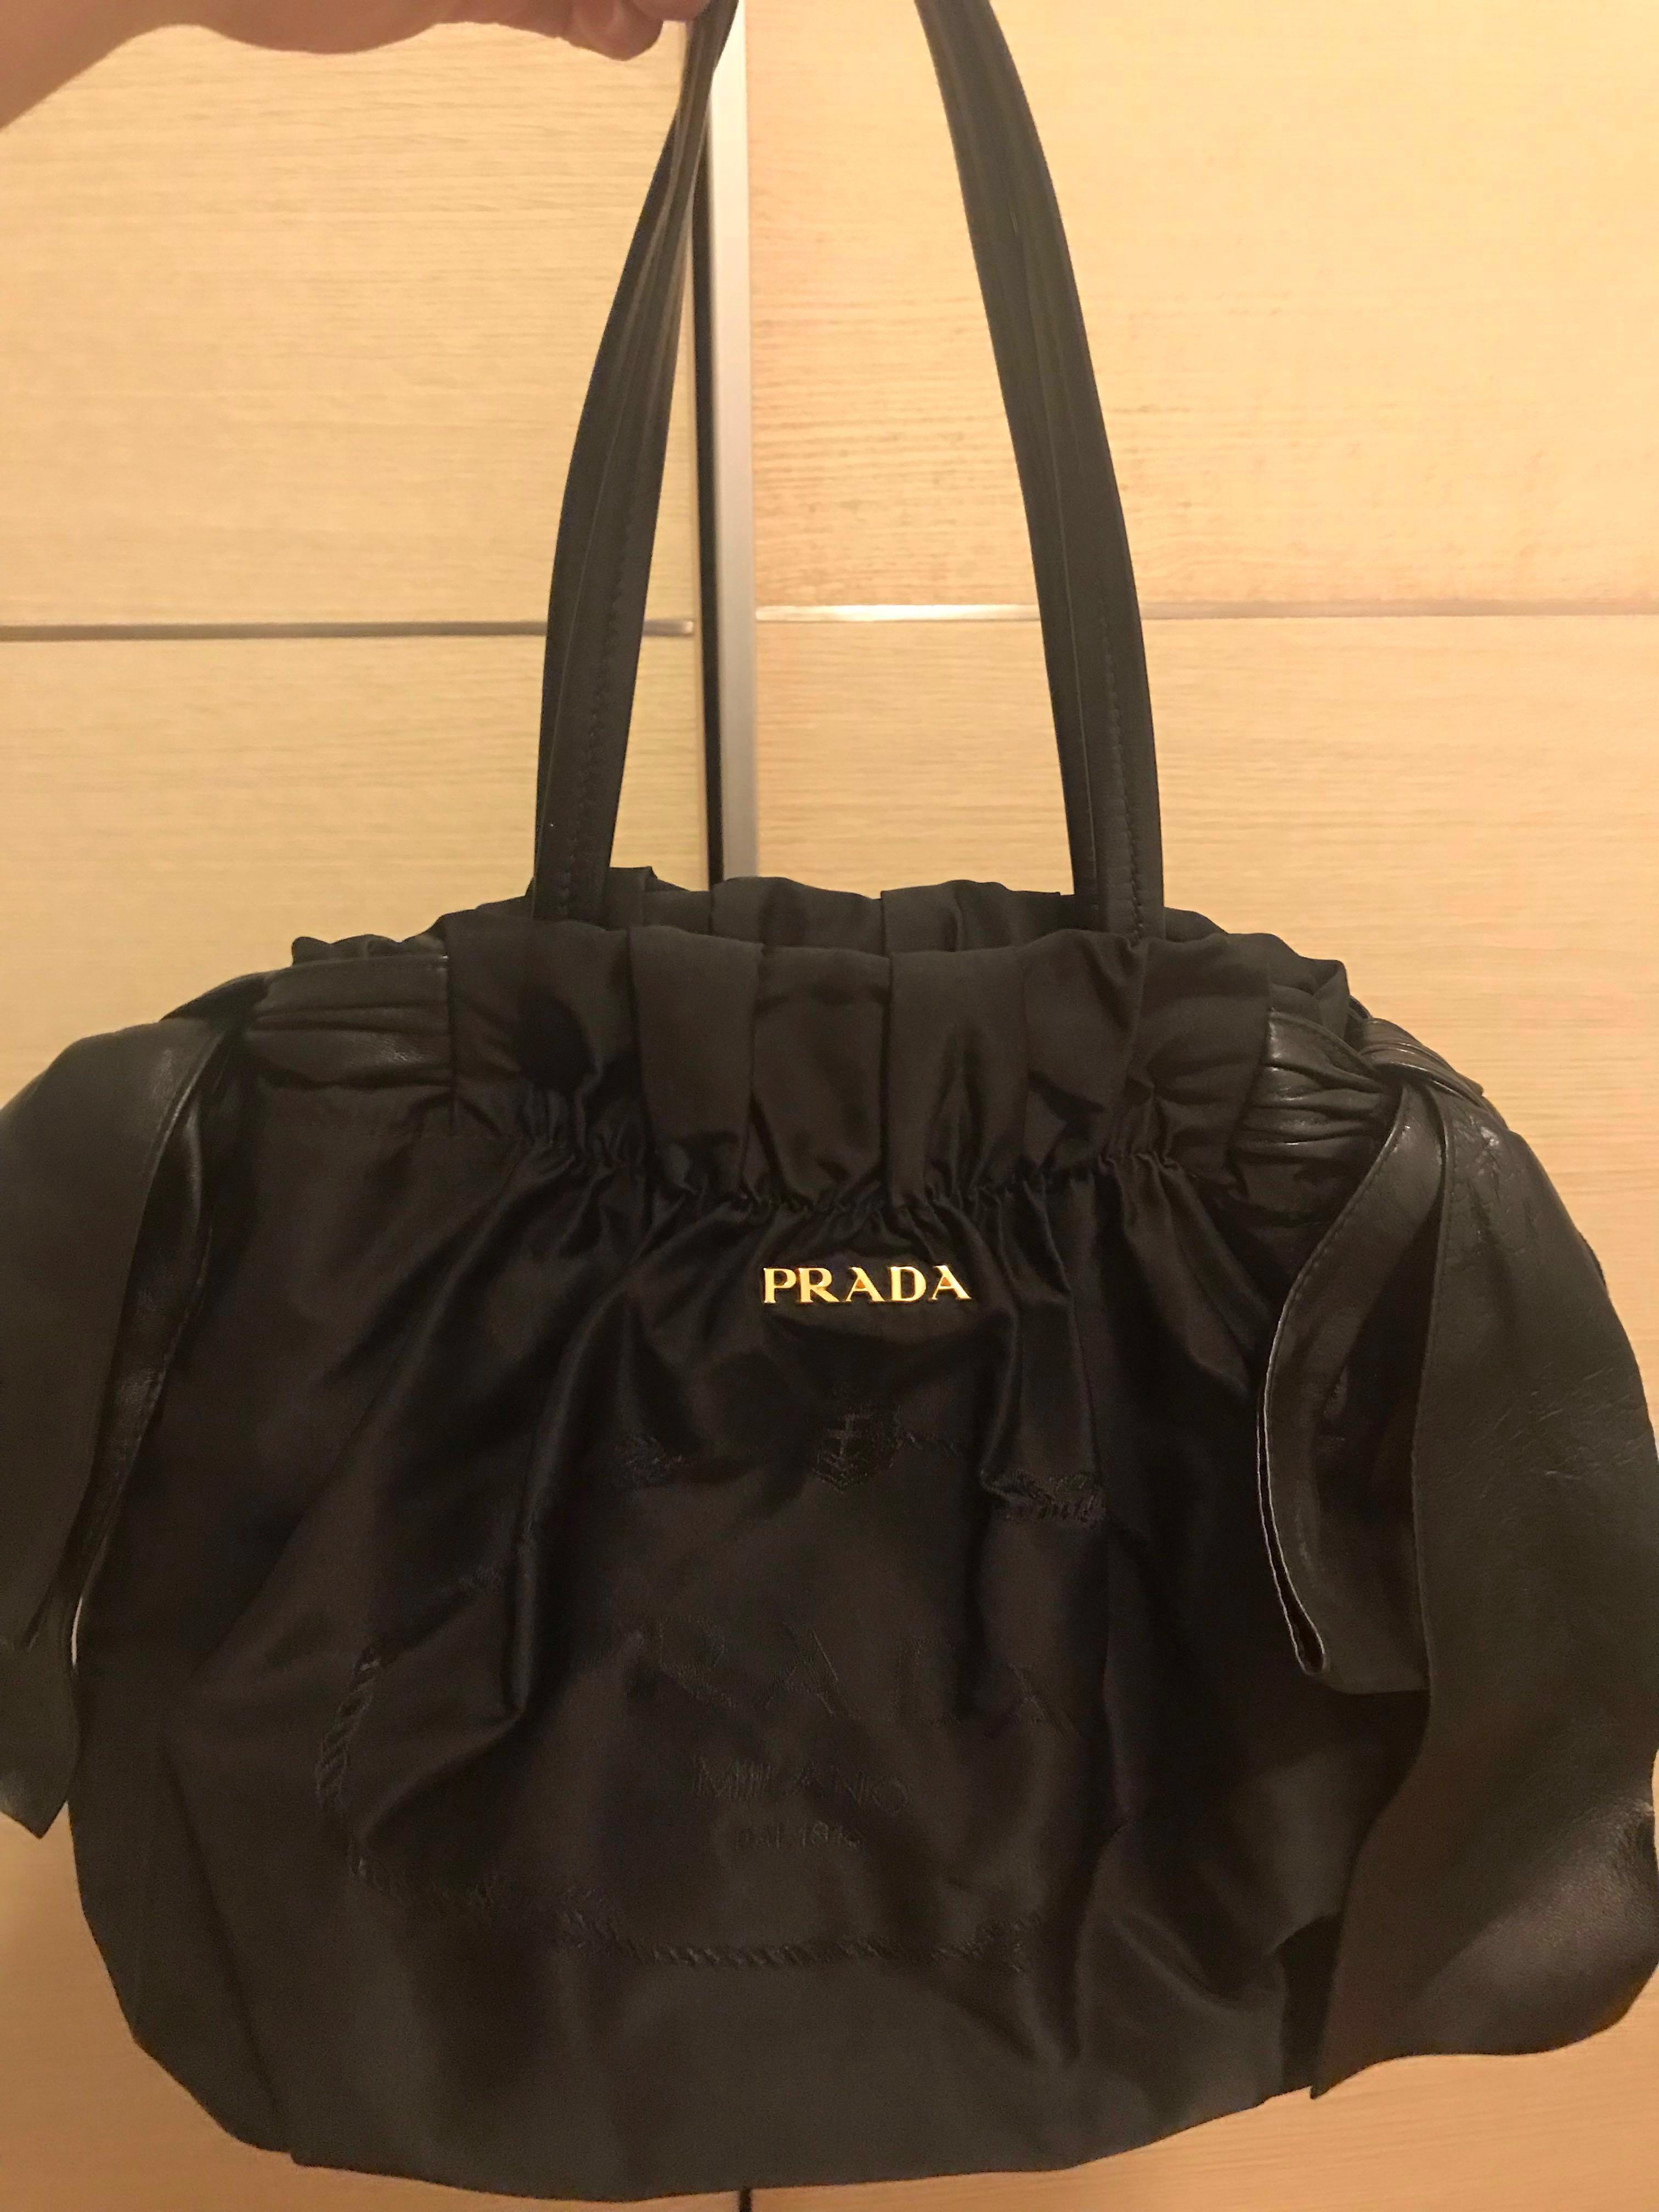 fa0d9c5b068 Original Prada bag for sale on Carousell